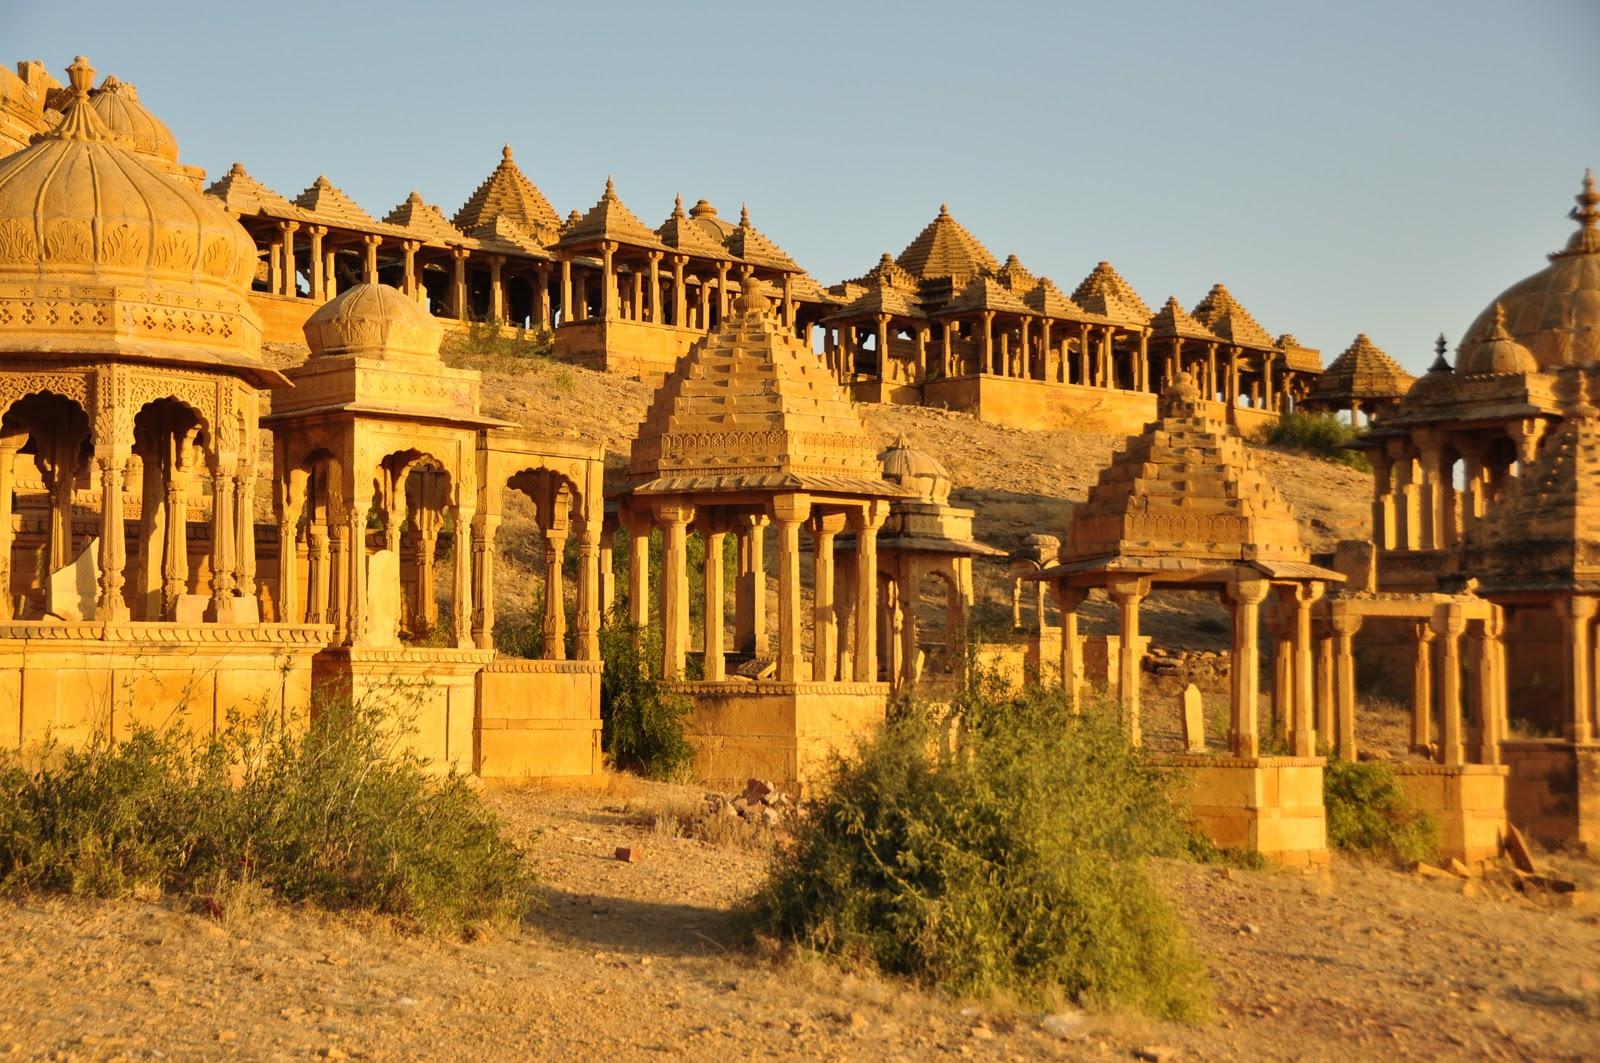 Jaisalmer India  city photos gallery : Let's Go...: Jaisalmer, India